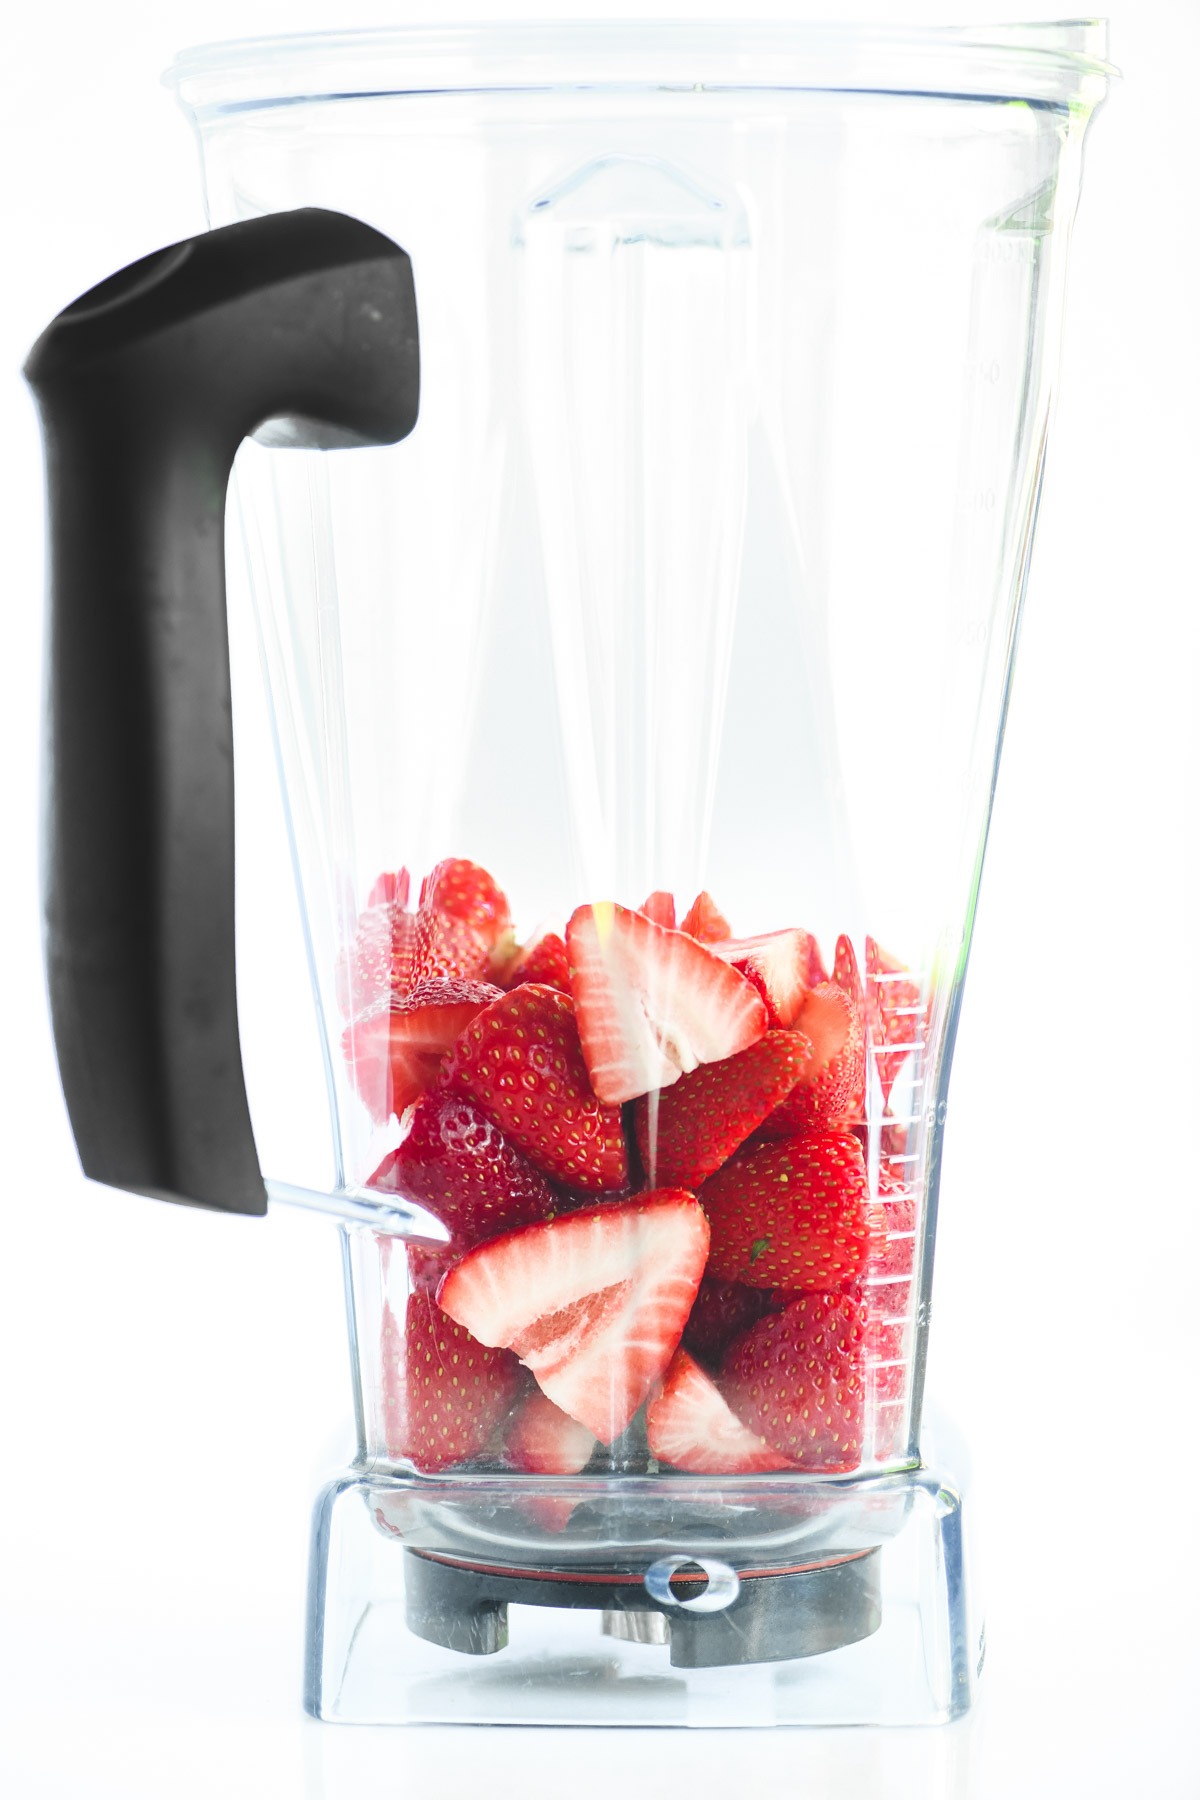 fresh strawberries in a blender